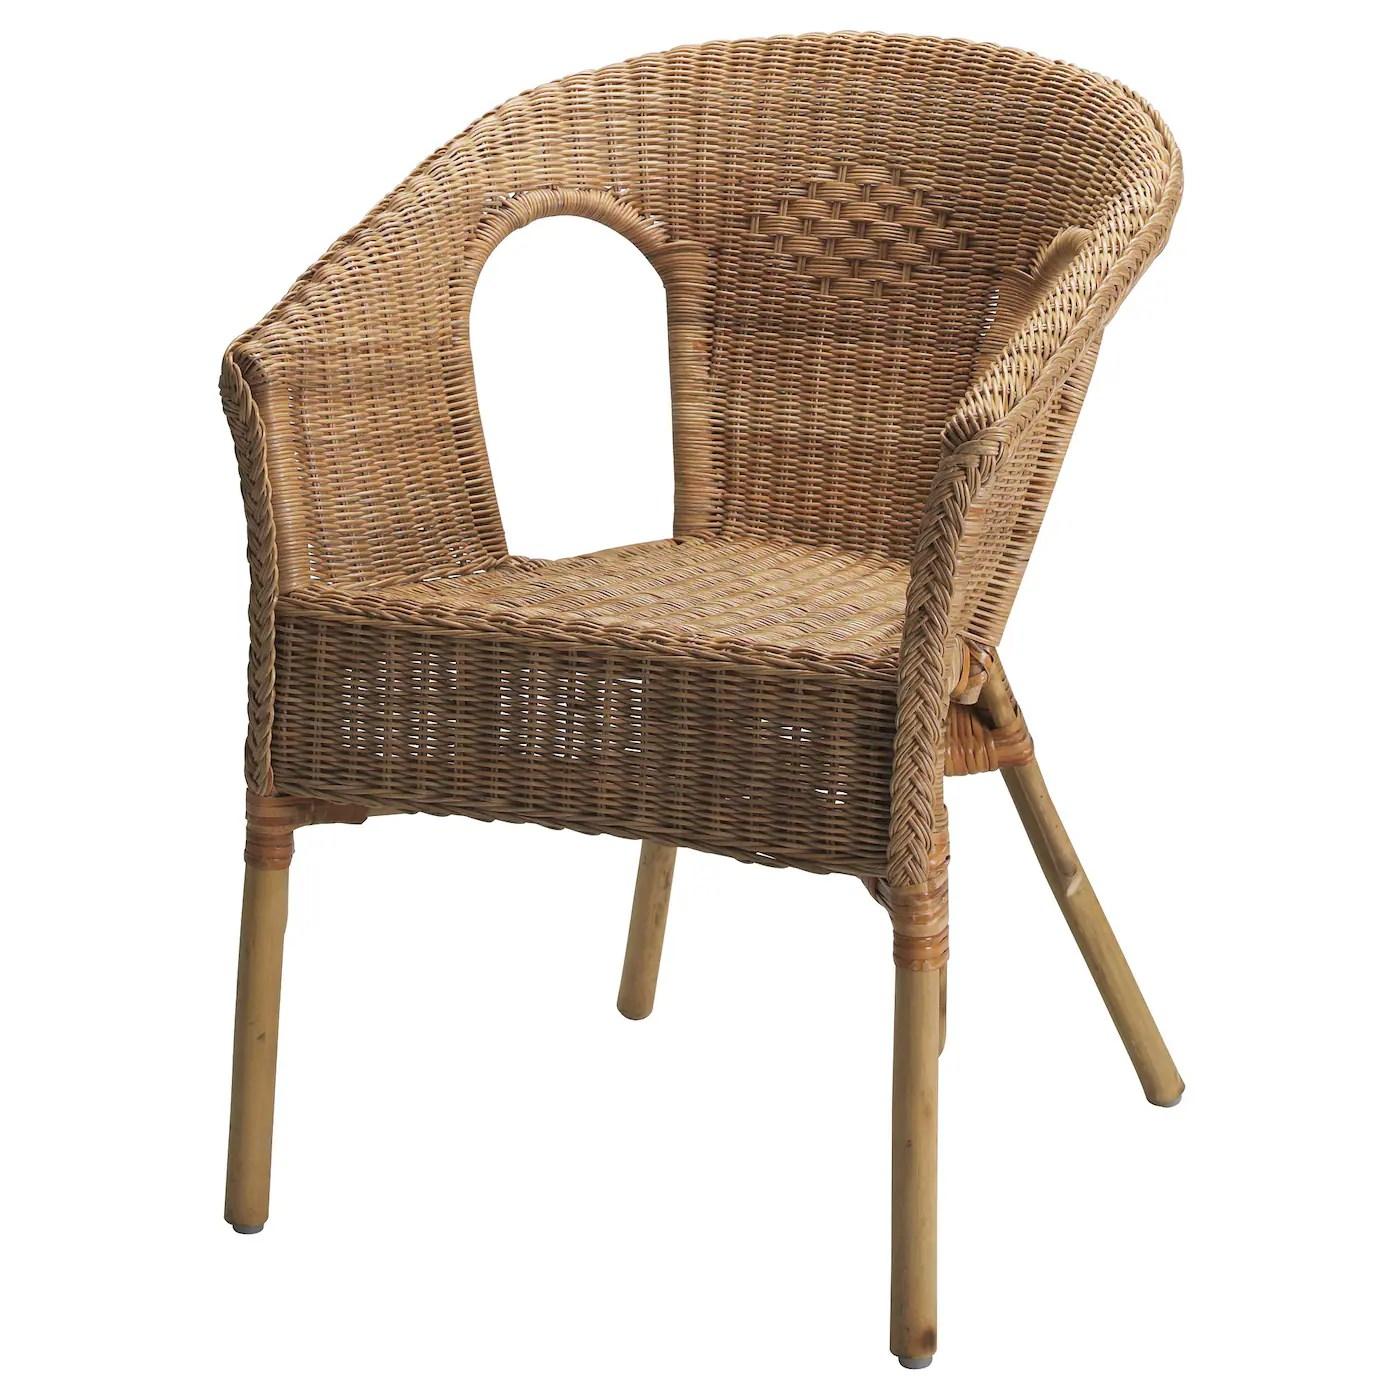 Agen Fauteuil Rotin Bambou Materiau Durable Ikea